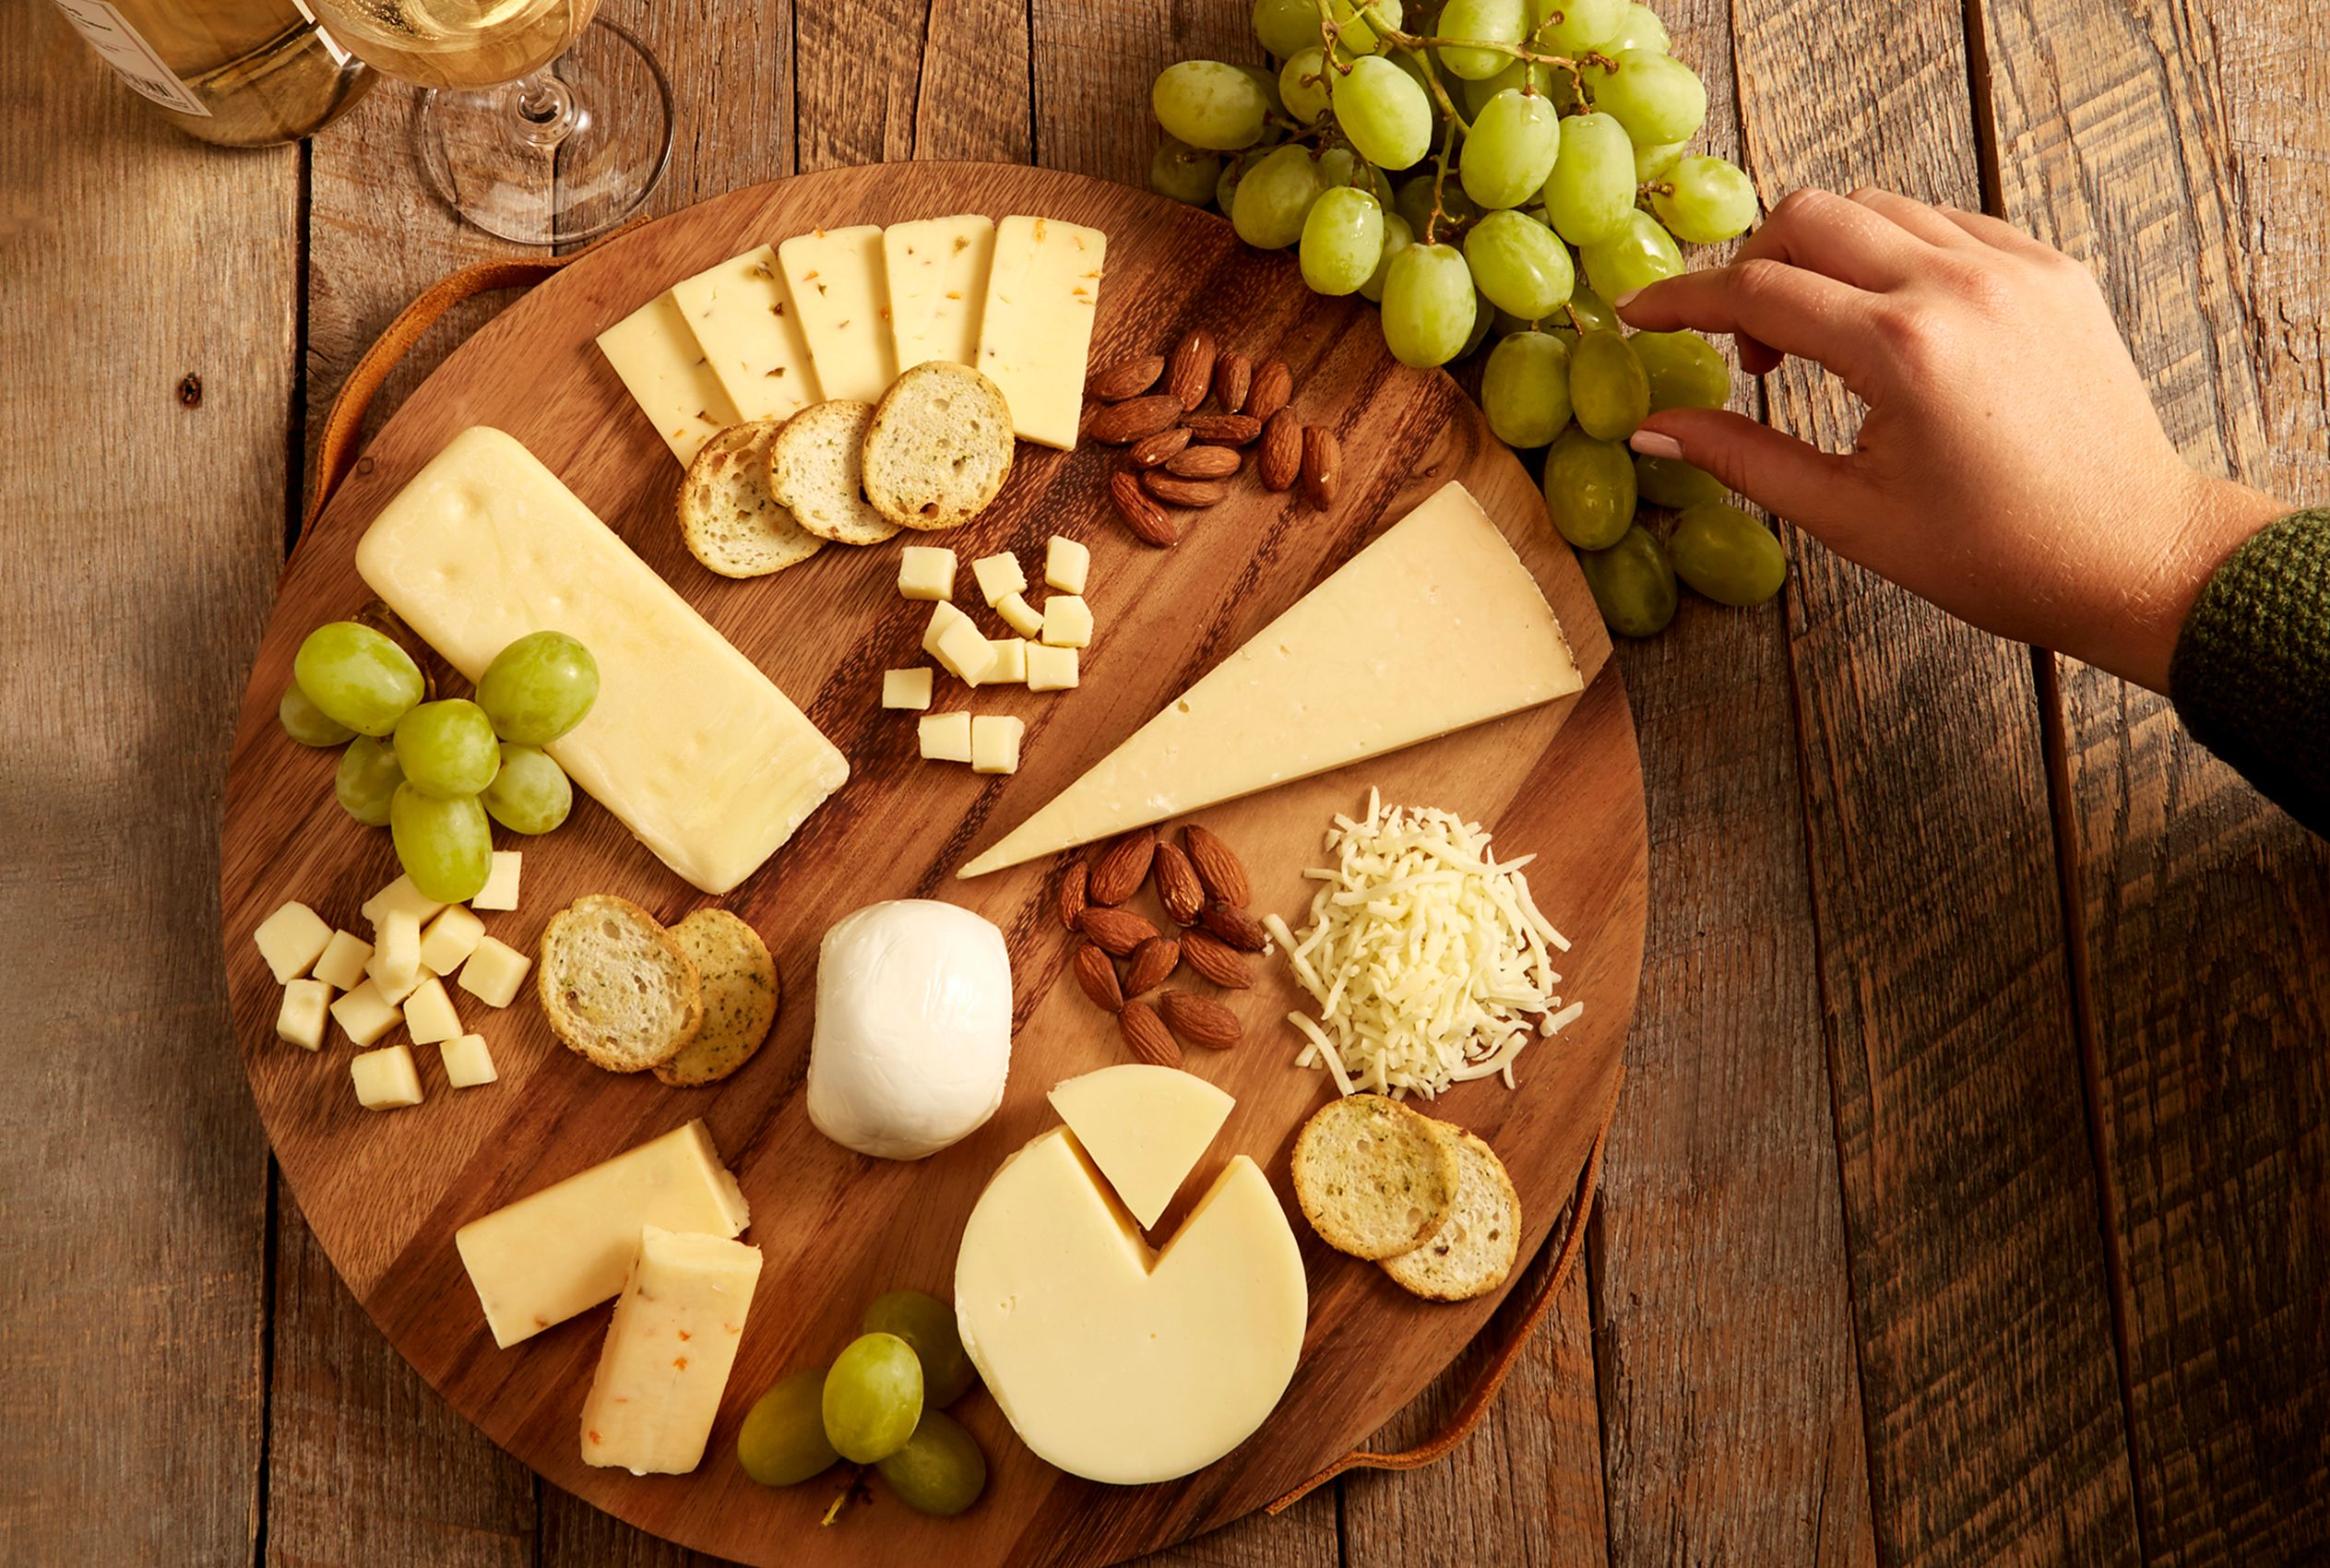 Cheese_Plate8816_F_W.jpg